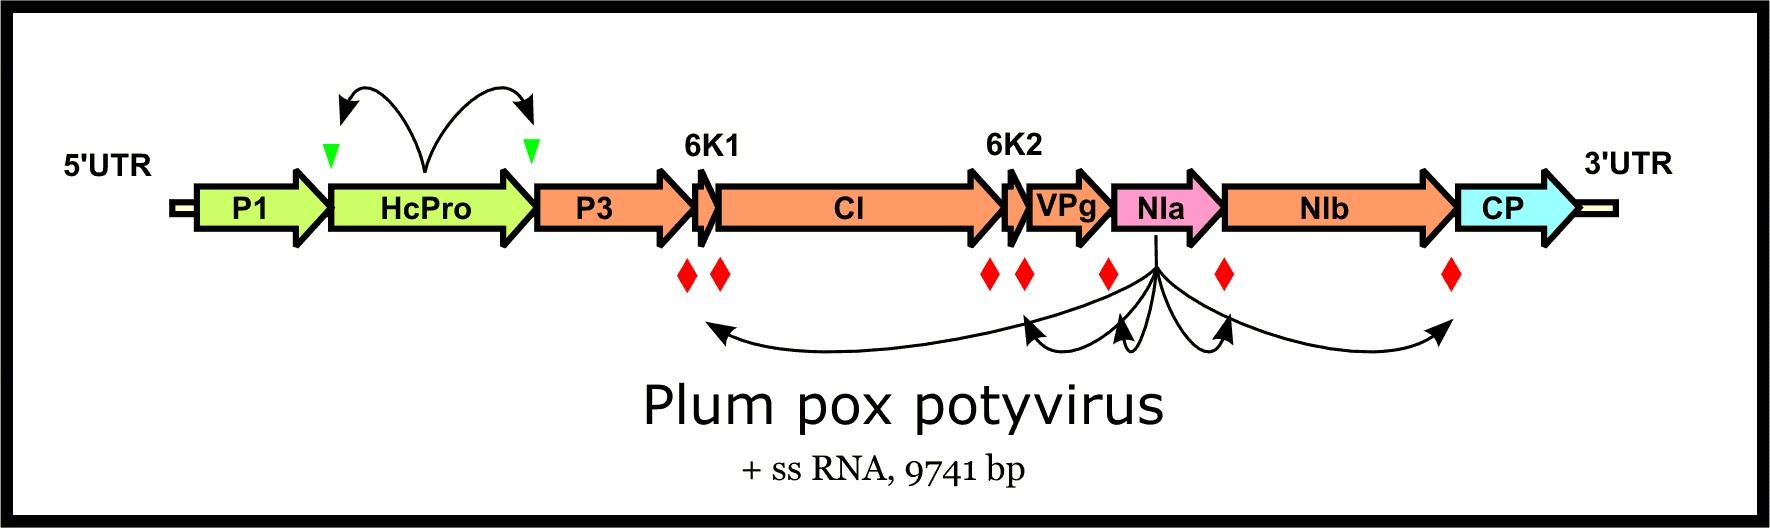 Image of Plum pox virus